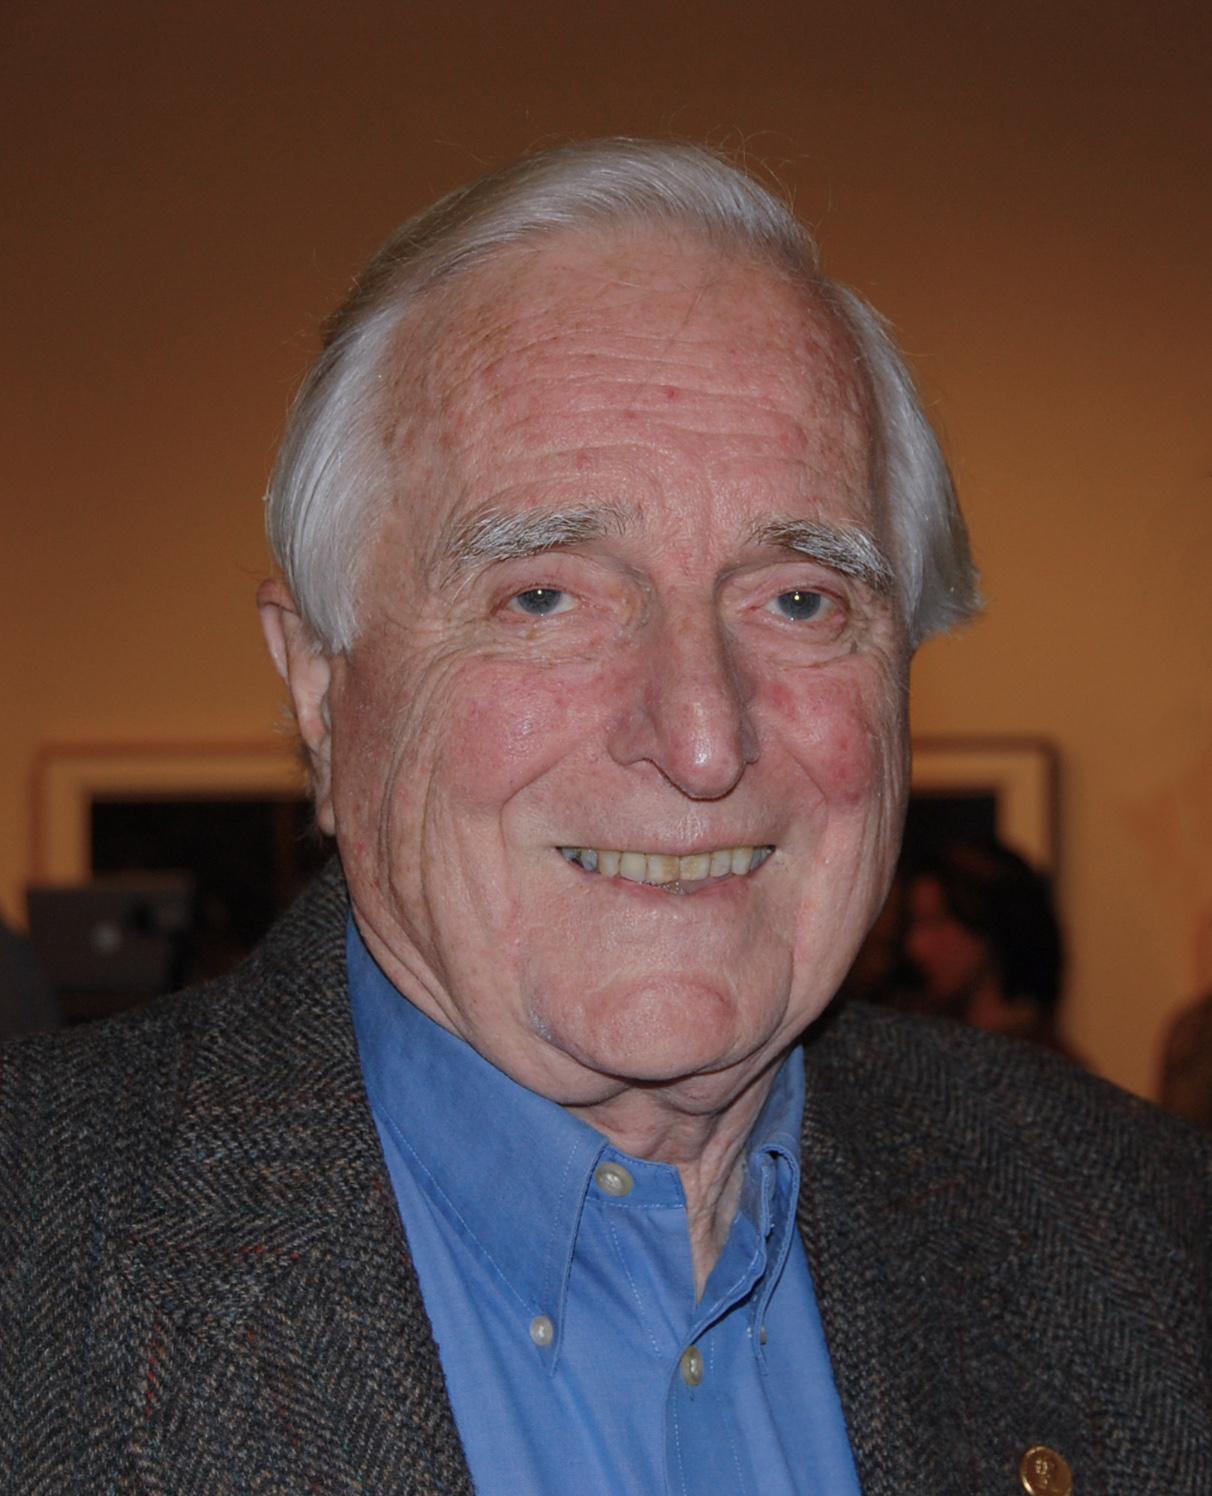 Douglas_Engelbart_in_2008 -